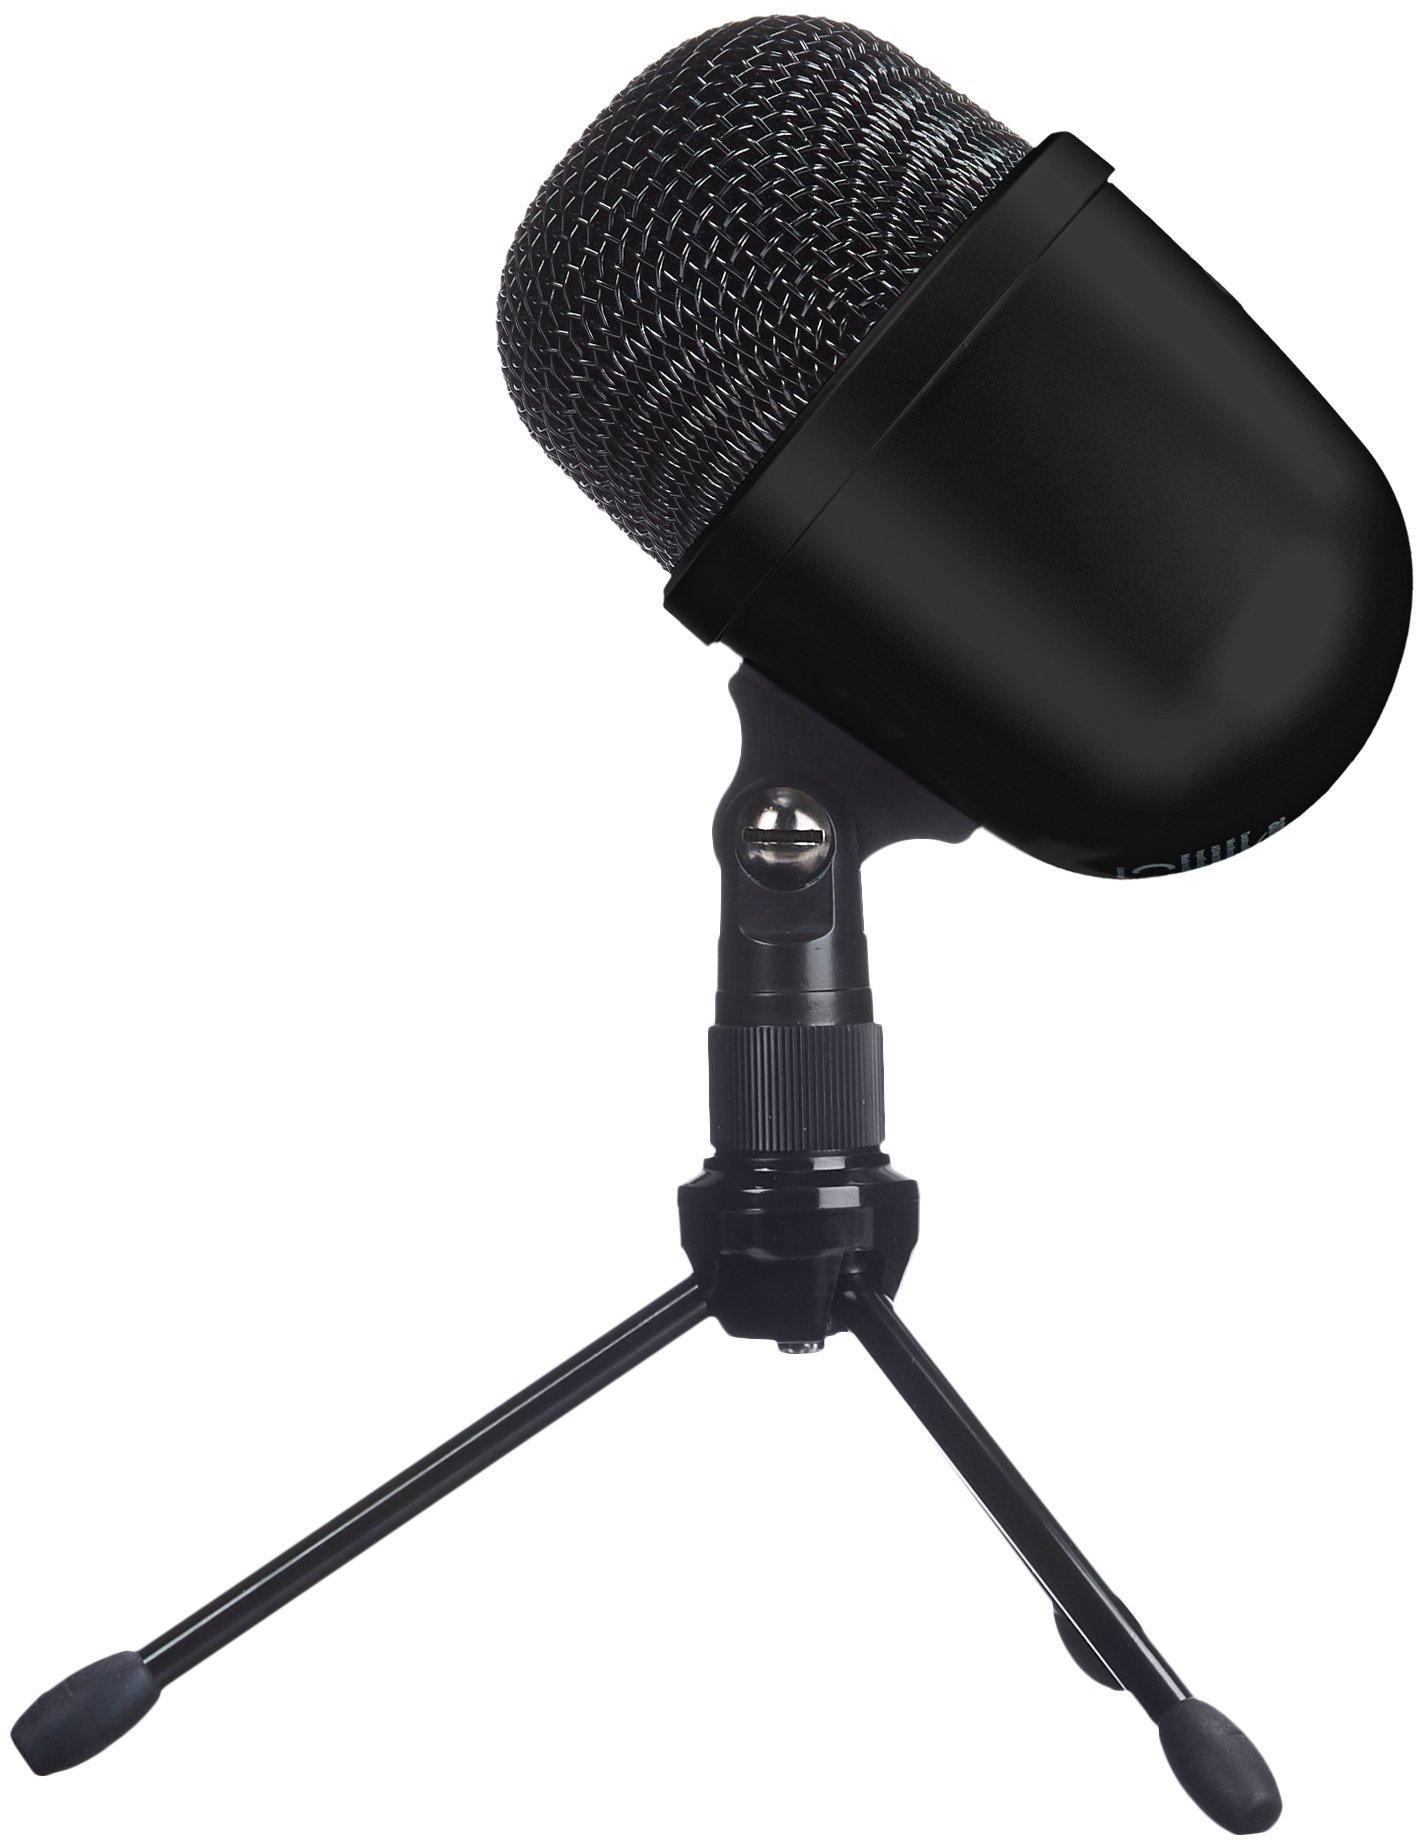 AmazonBasics Desktop Mini Condenser Microphone With Tripod - Black by AmazonBasics